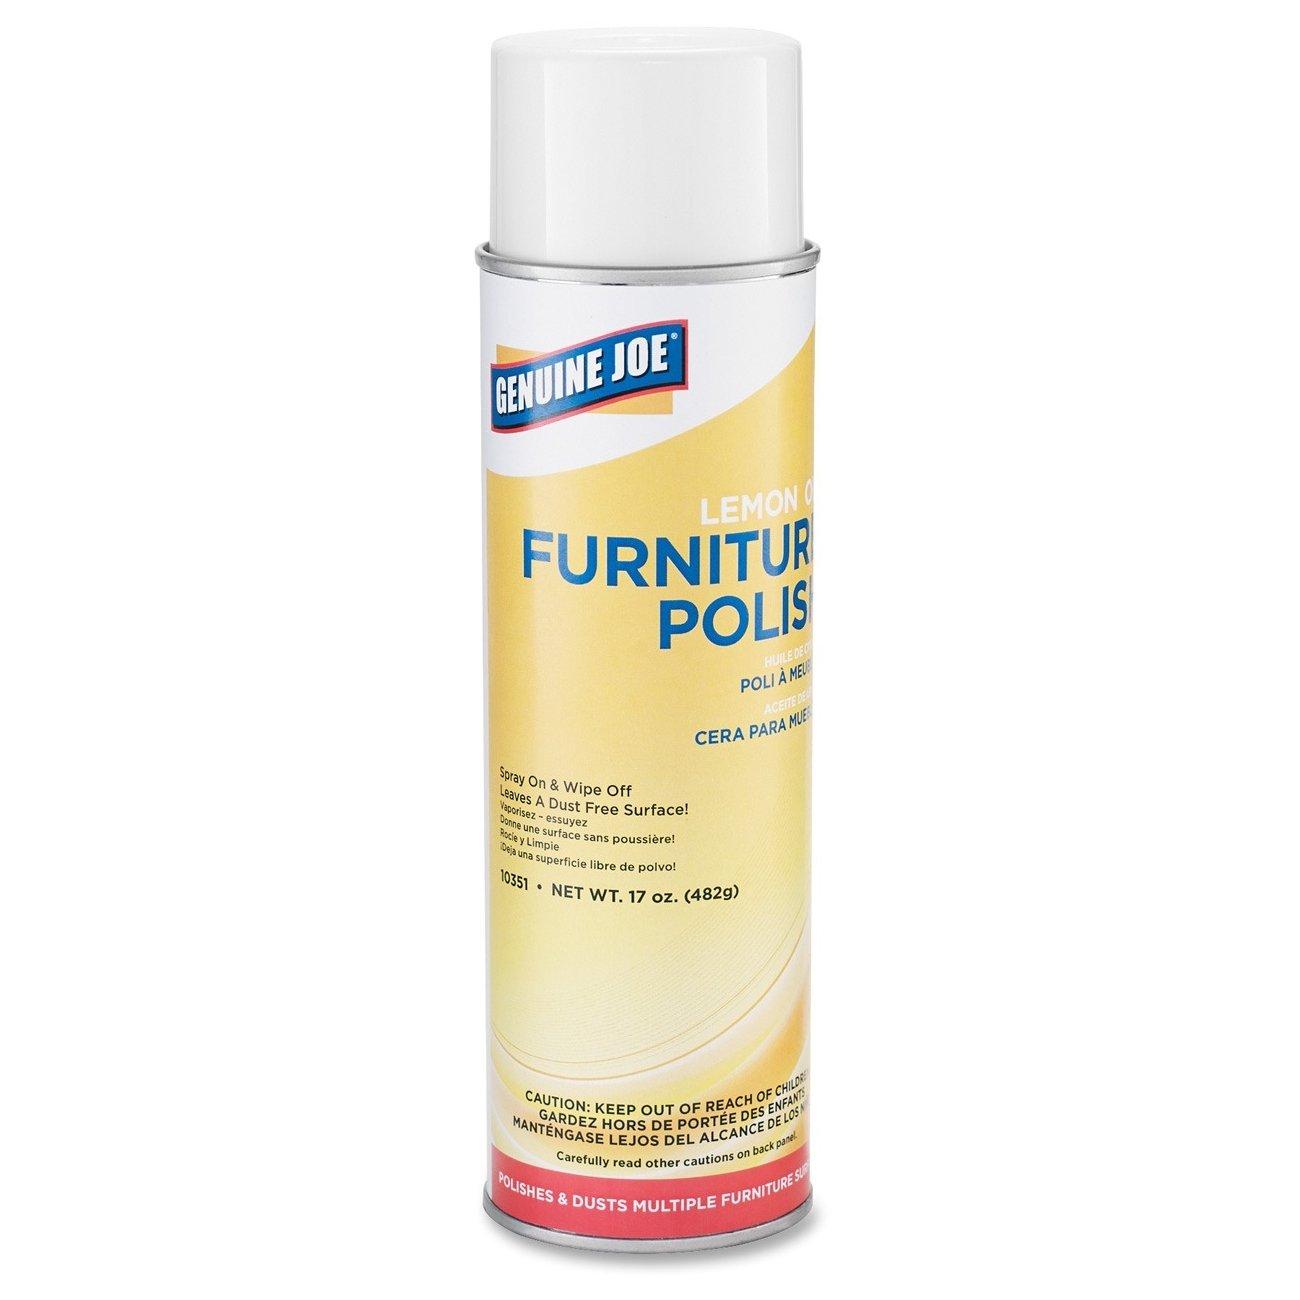 Genuine Joe GJO10351CT Furniture Polish Spray, 17 oz, Lemon Scent (Pack of 12) by Genuine Joe (Image #1)